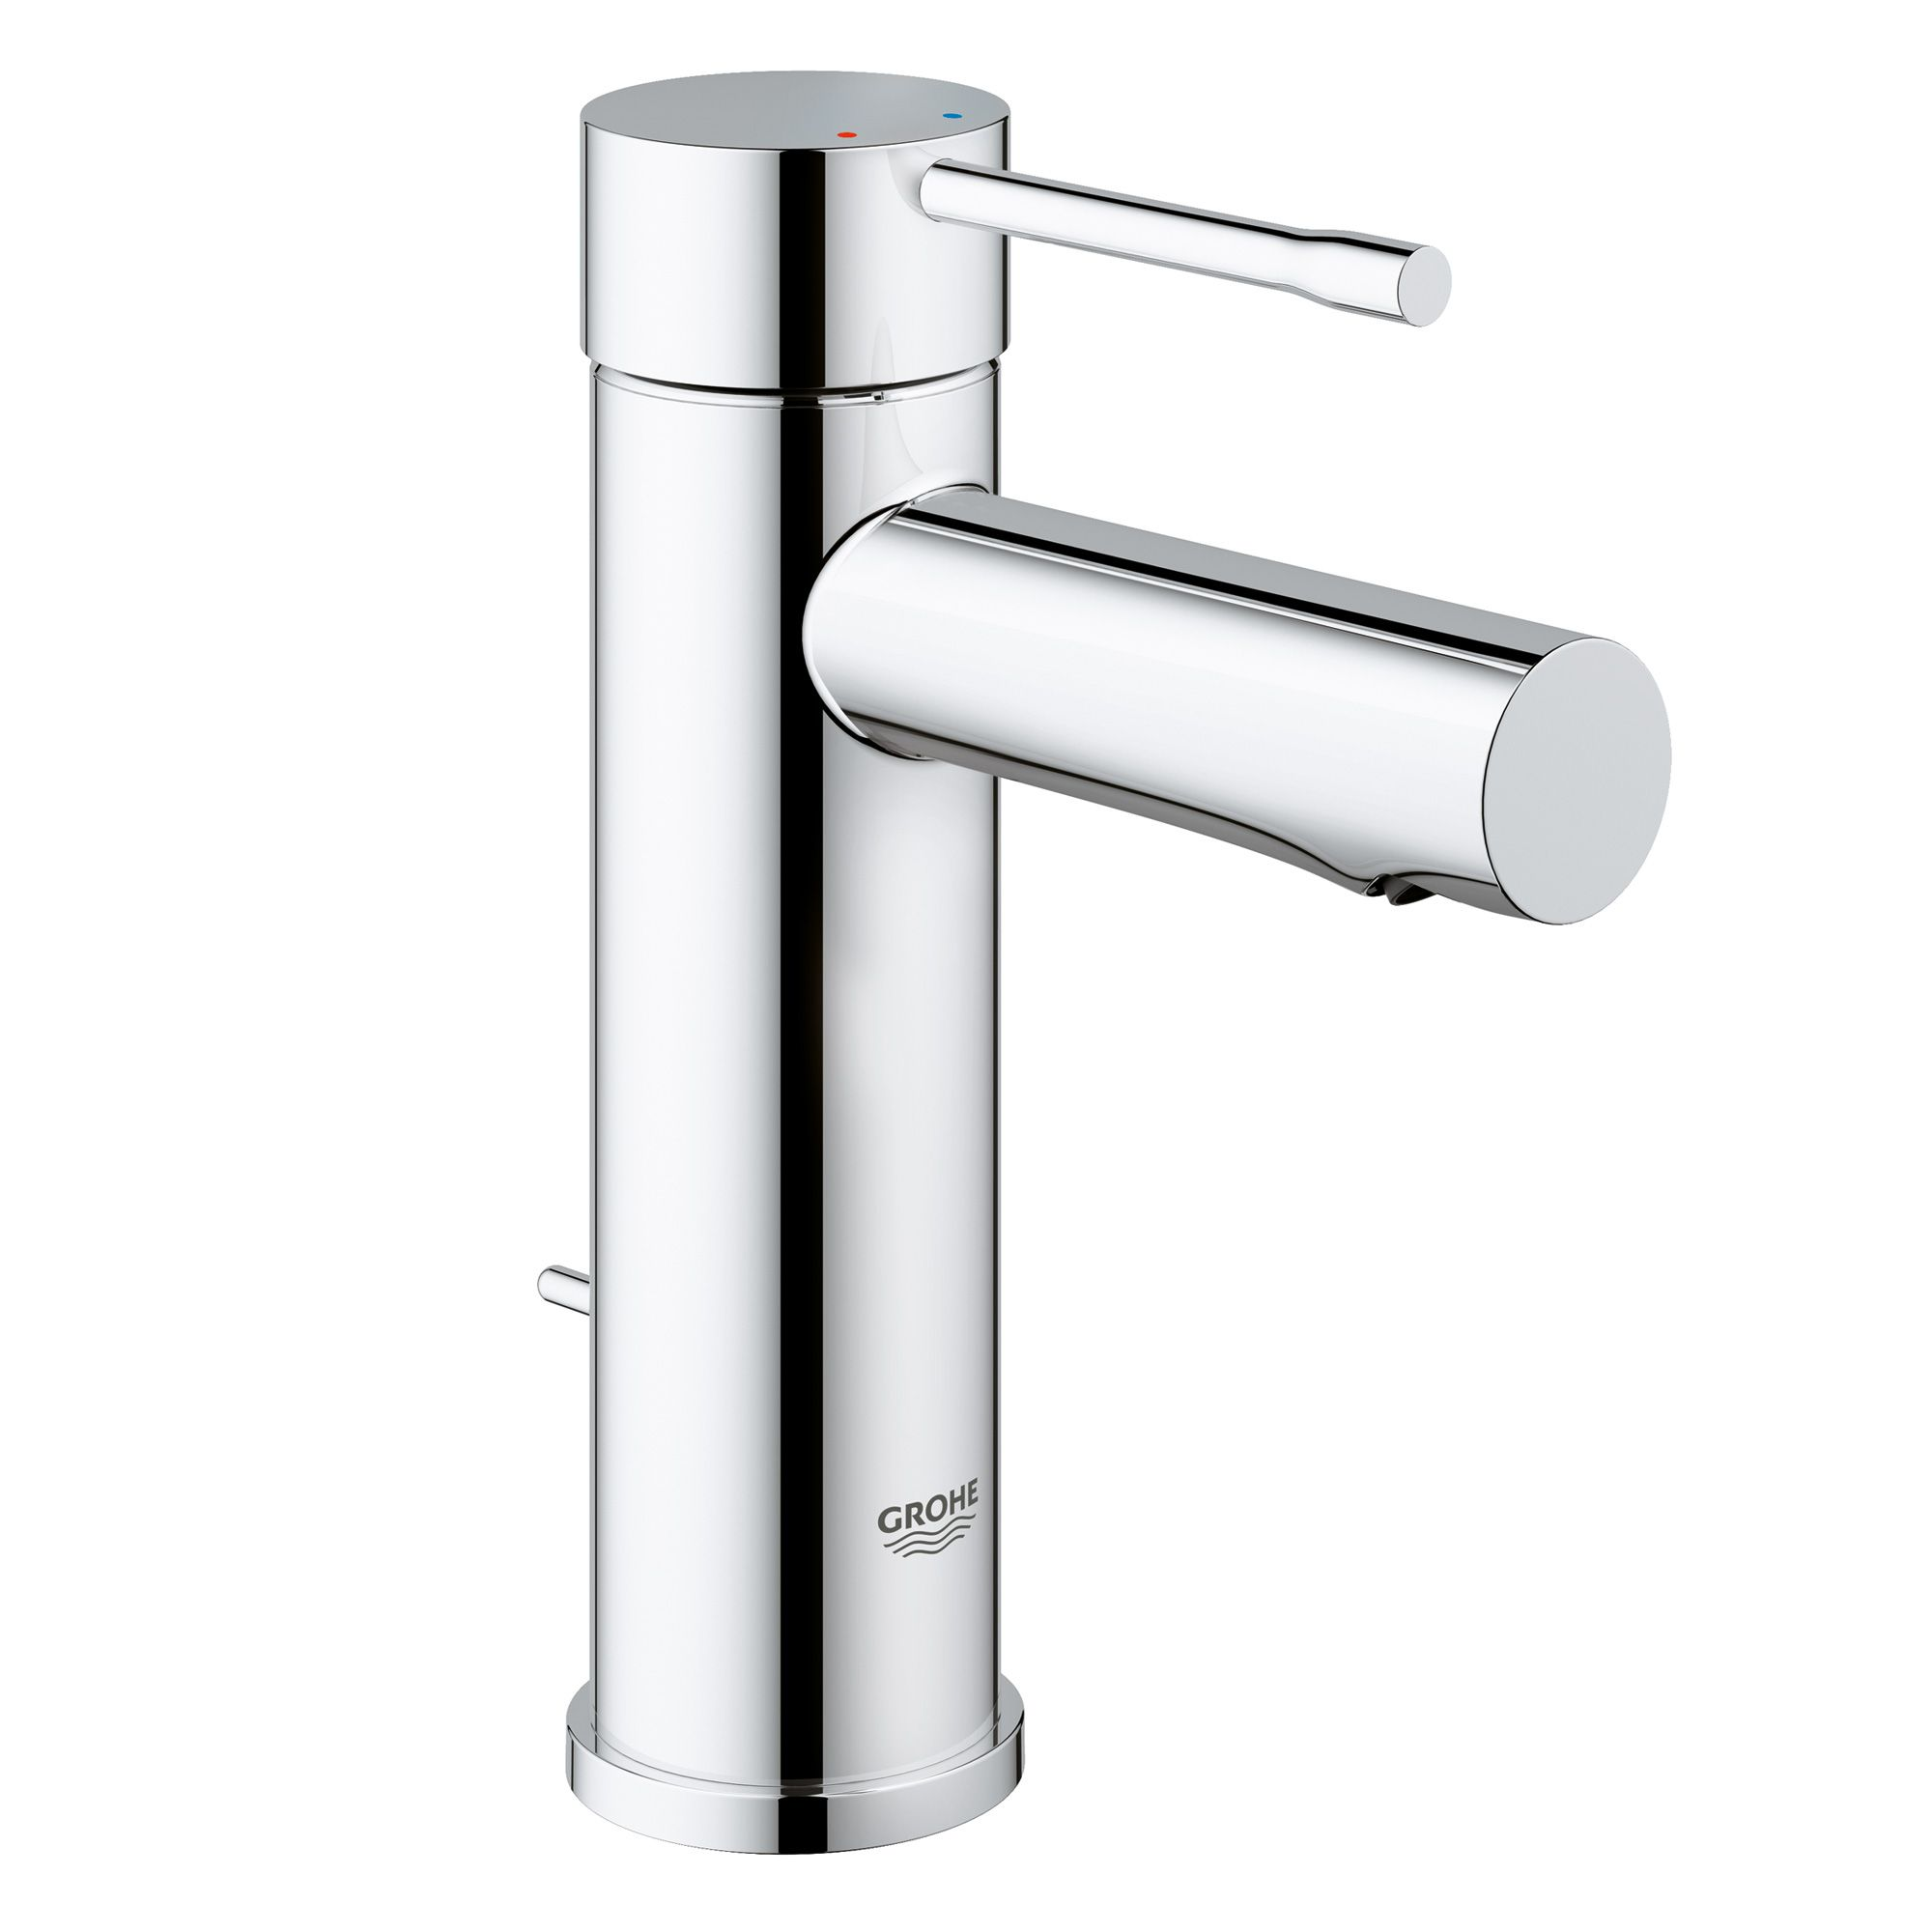 grohe essence basin mixer - Google Search | Taps | Pinterest | Basin ...